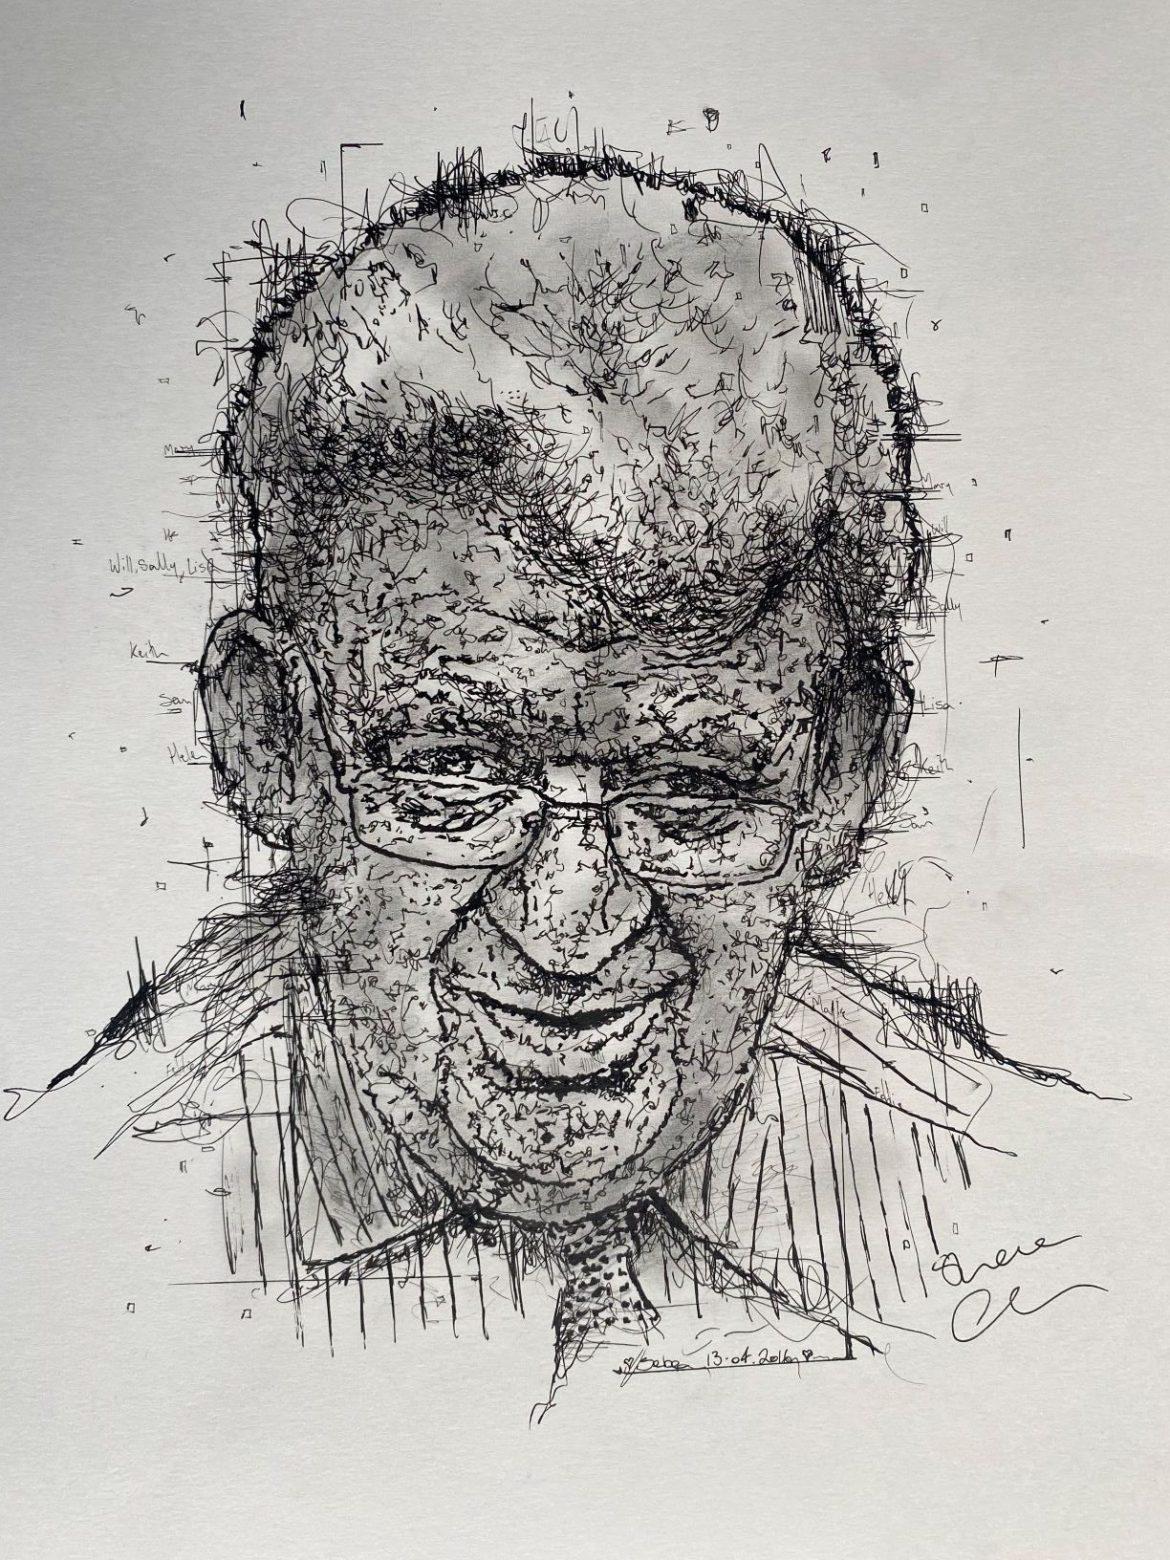 Willie J. Coonan, 1943 – 2020